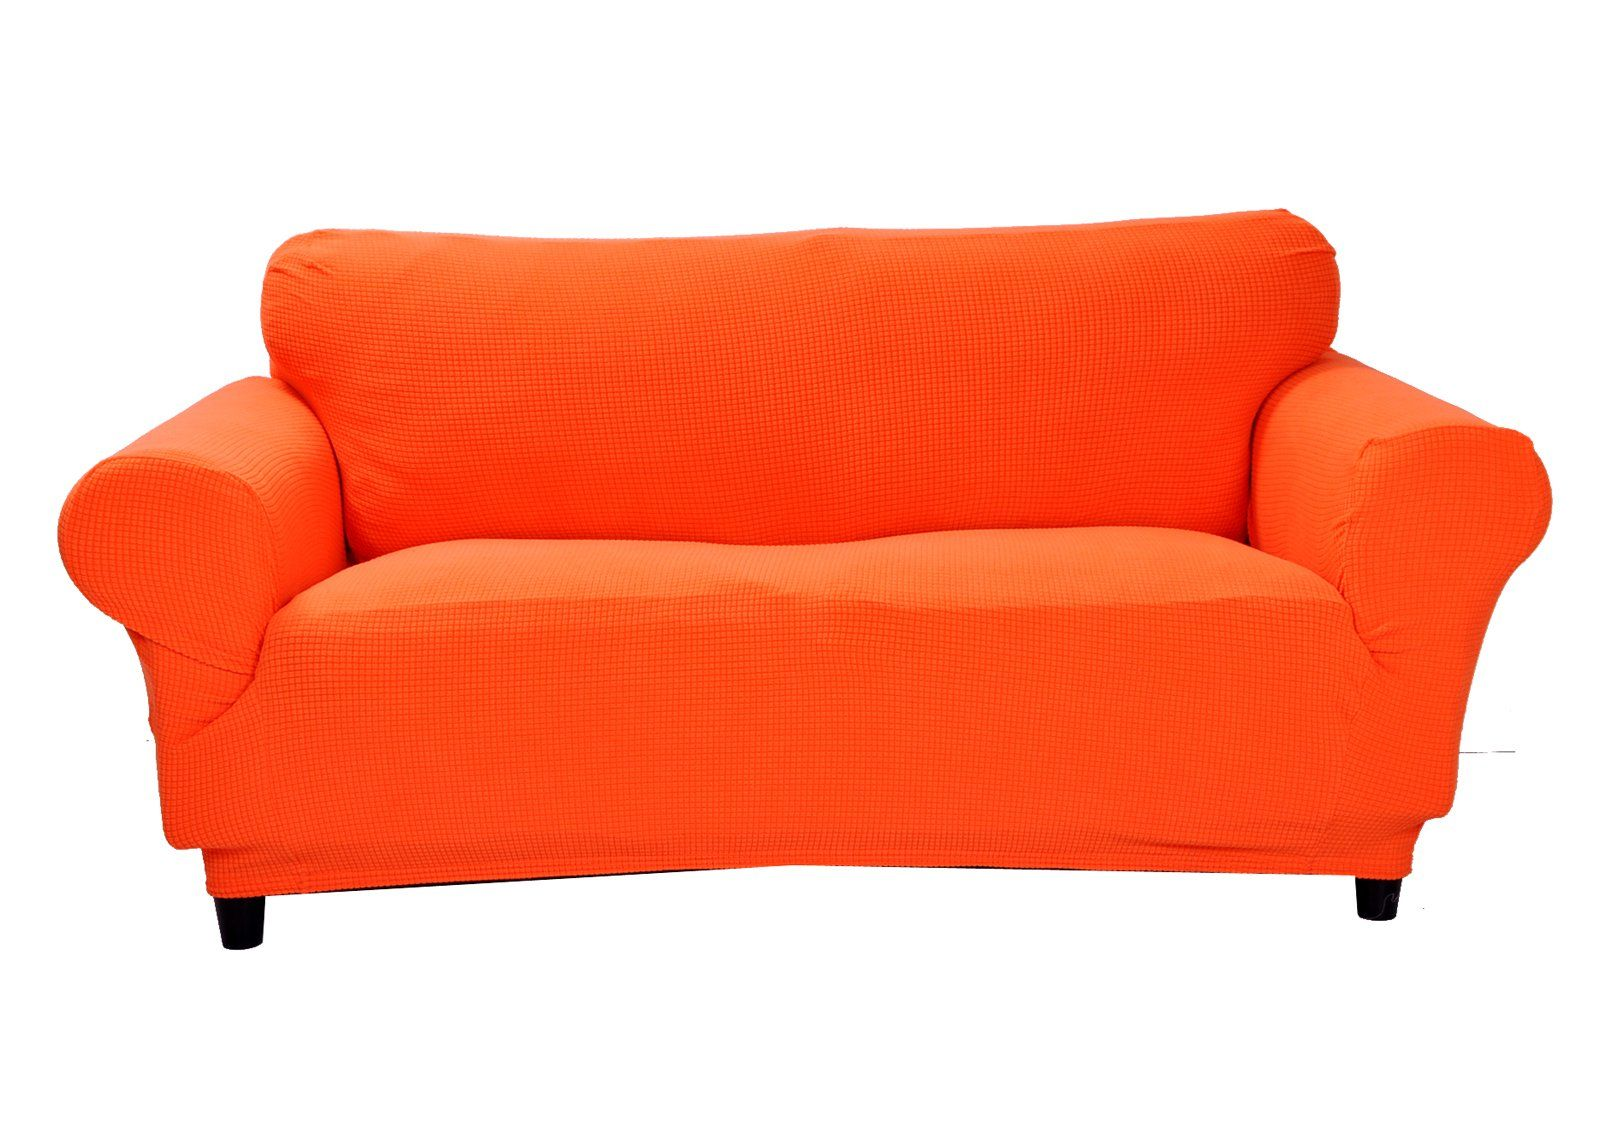 CHUNYI Jacquard Sofa Covers 1Piece Polyester